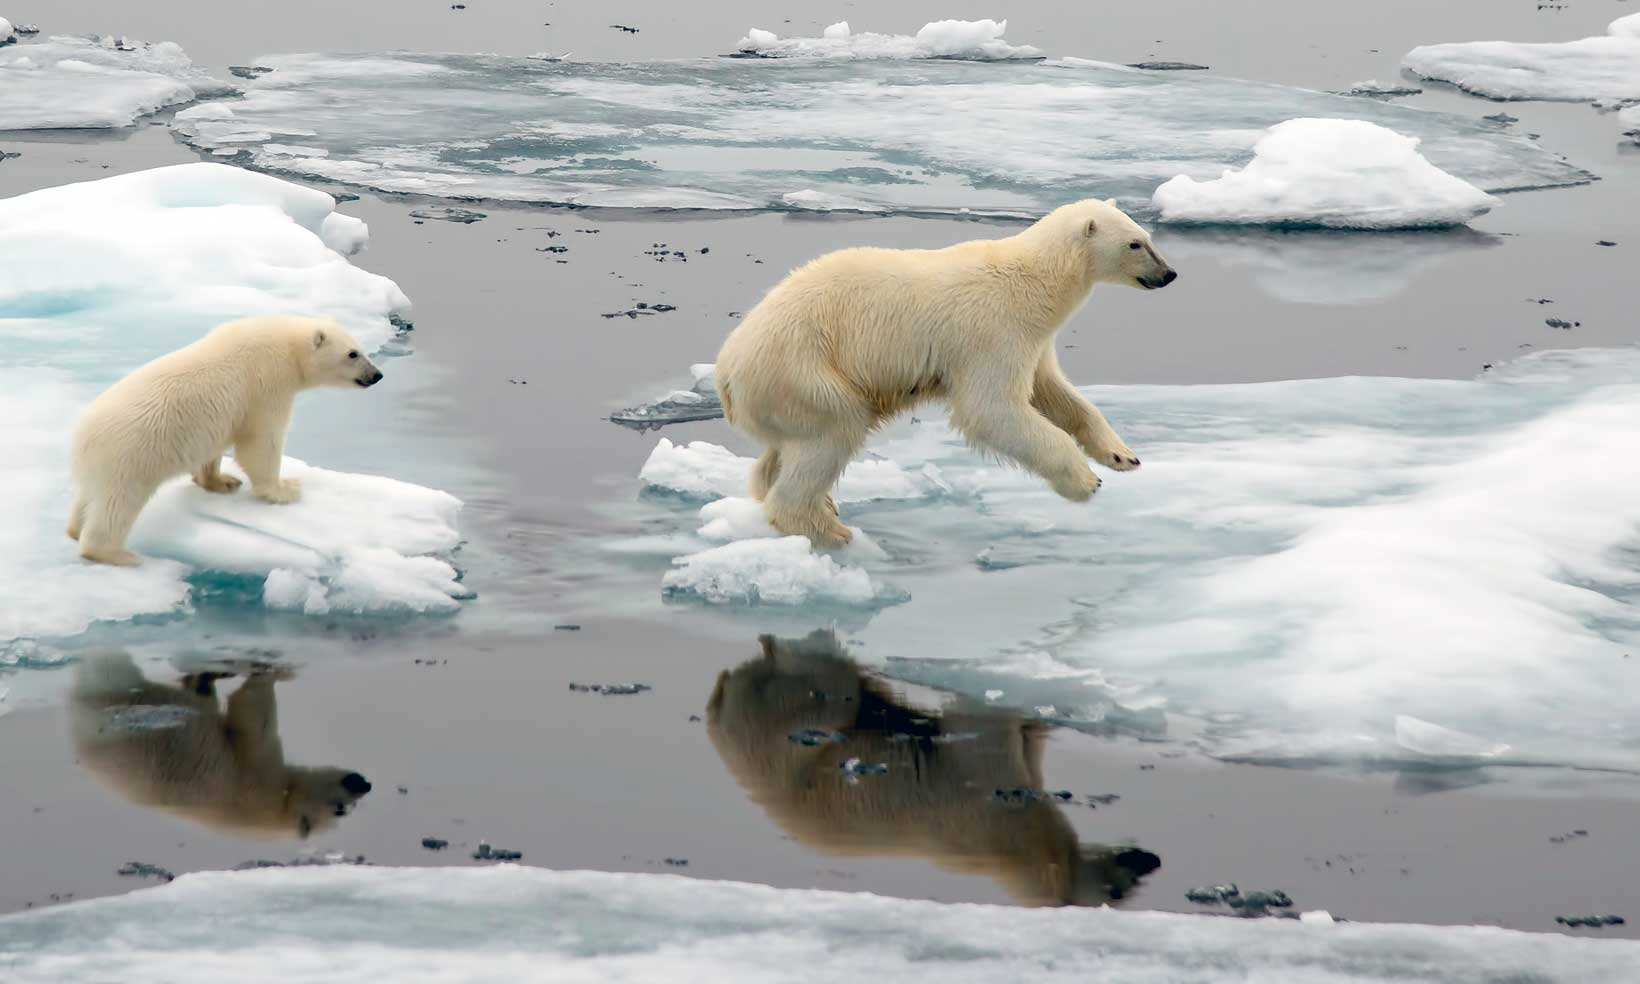 Polar bears jumping